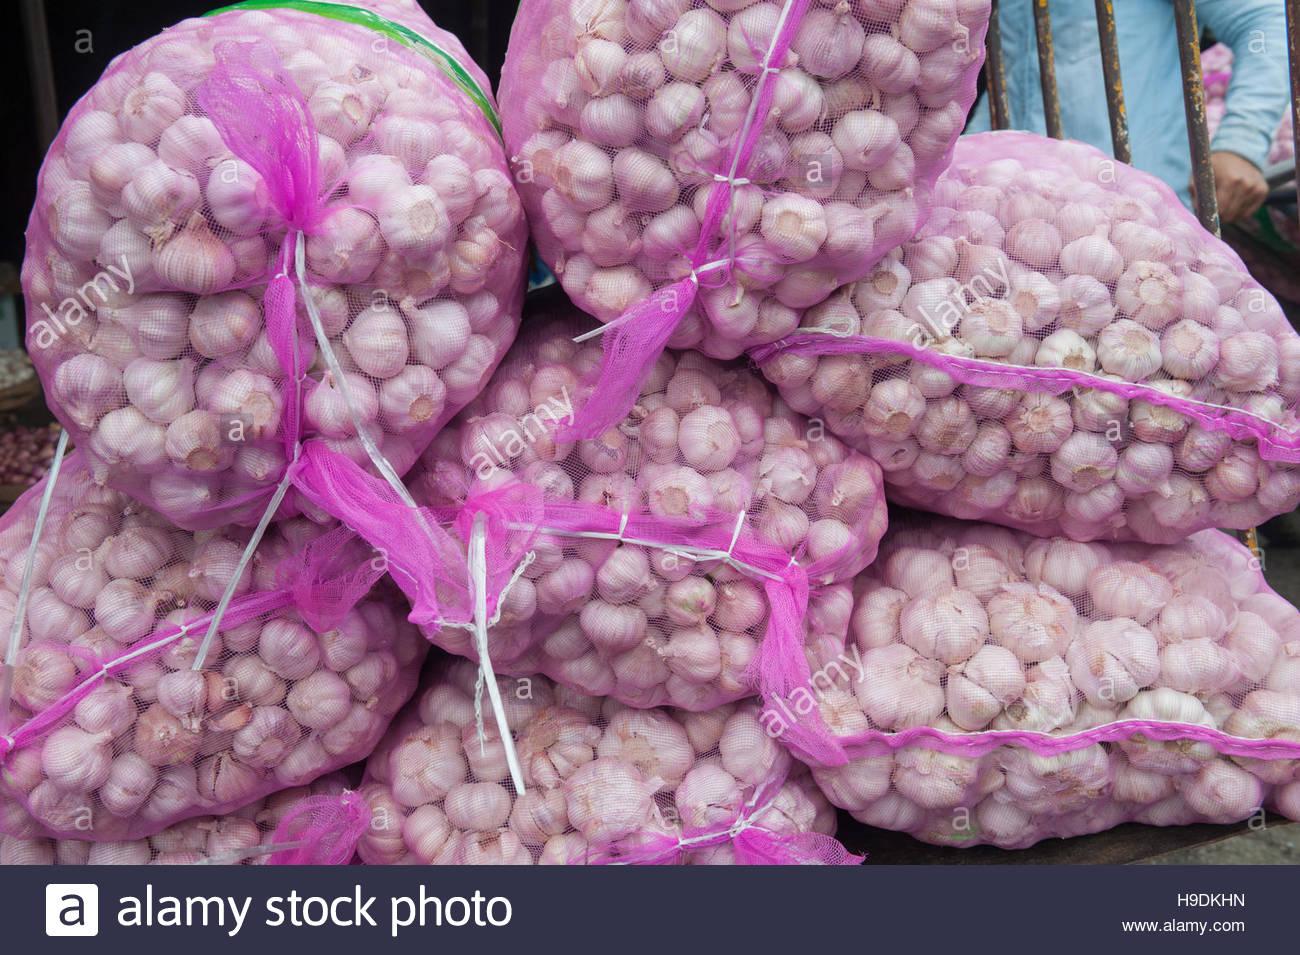 Hue Vietnam Huge sacks of garlic for sale at the Dong Ba Market. - Stock Image